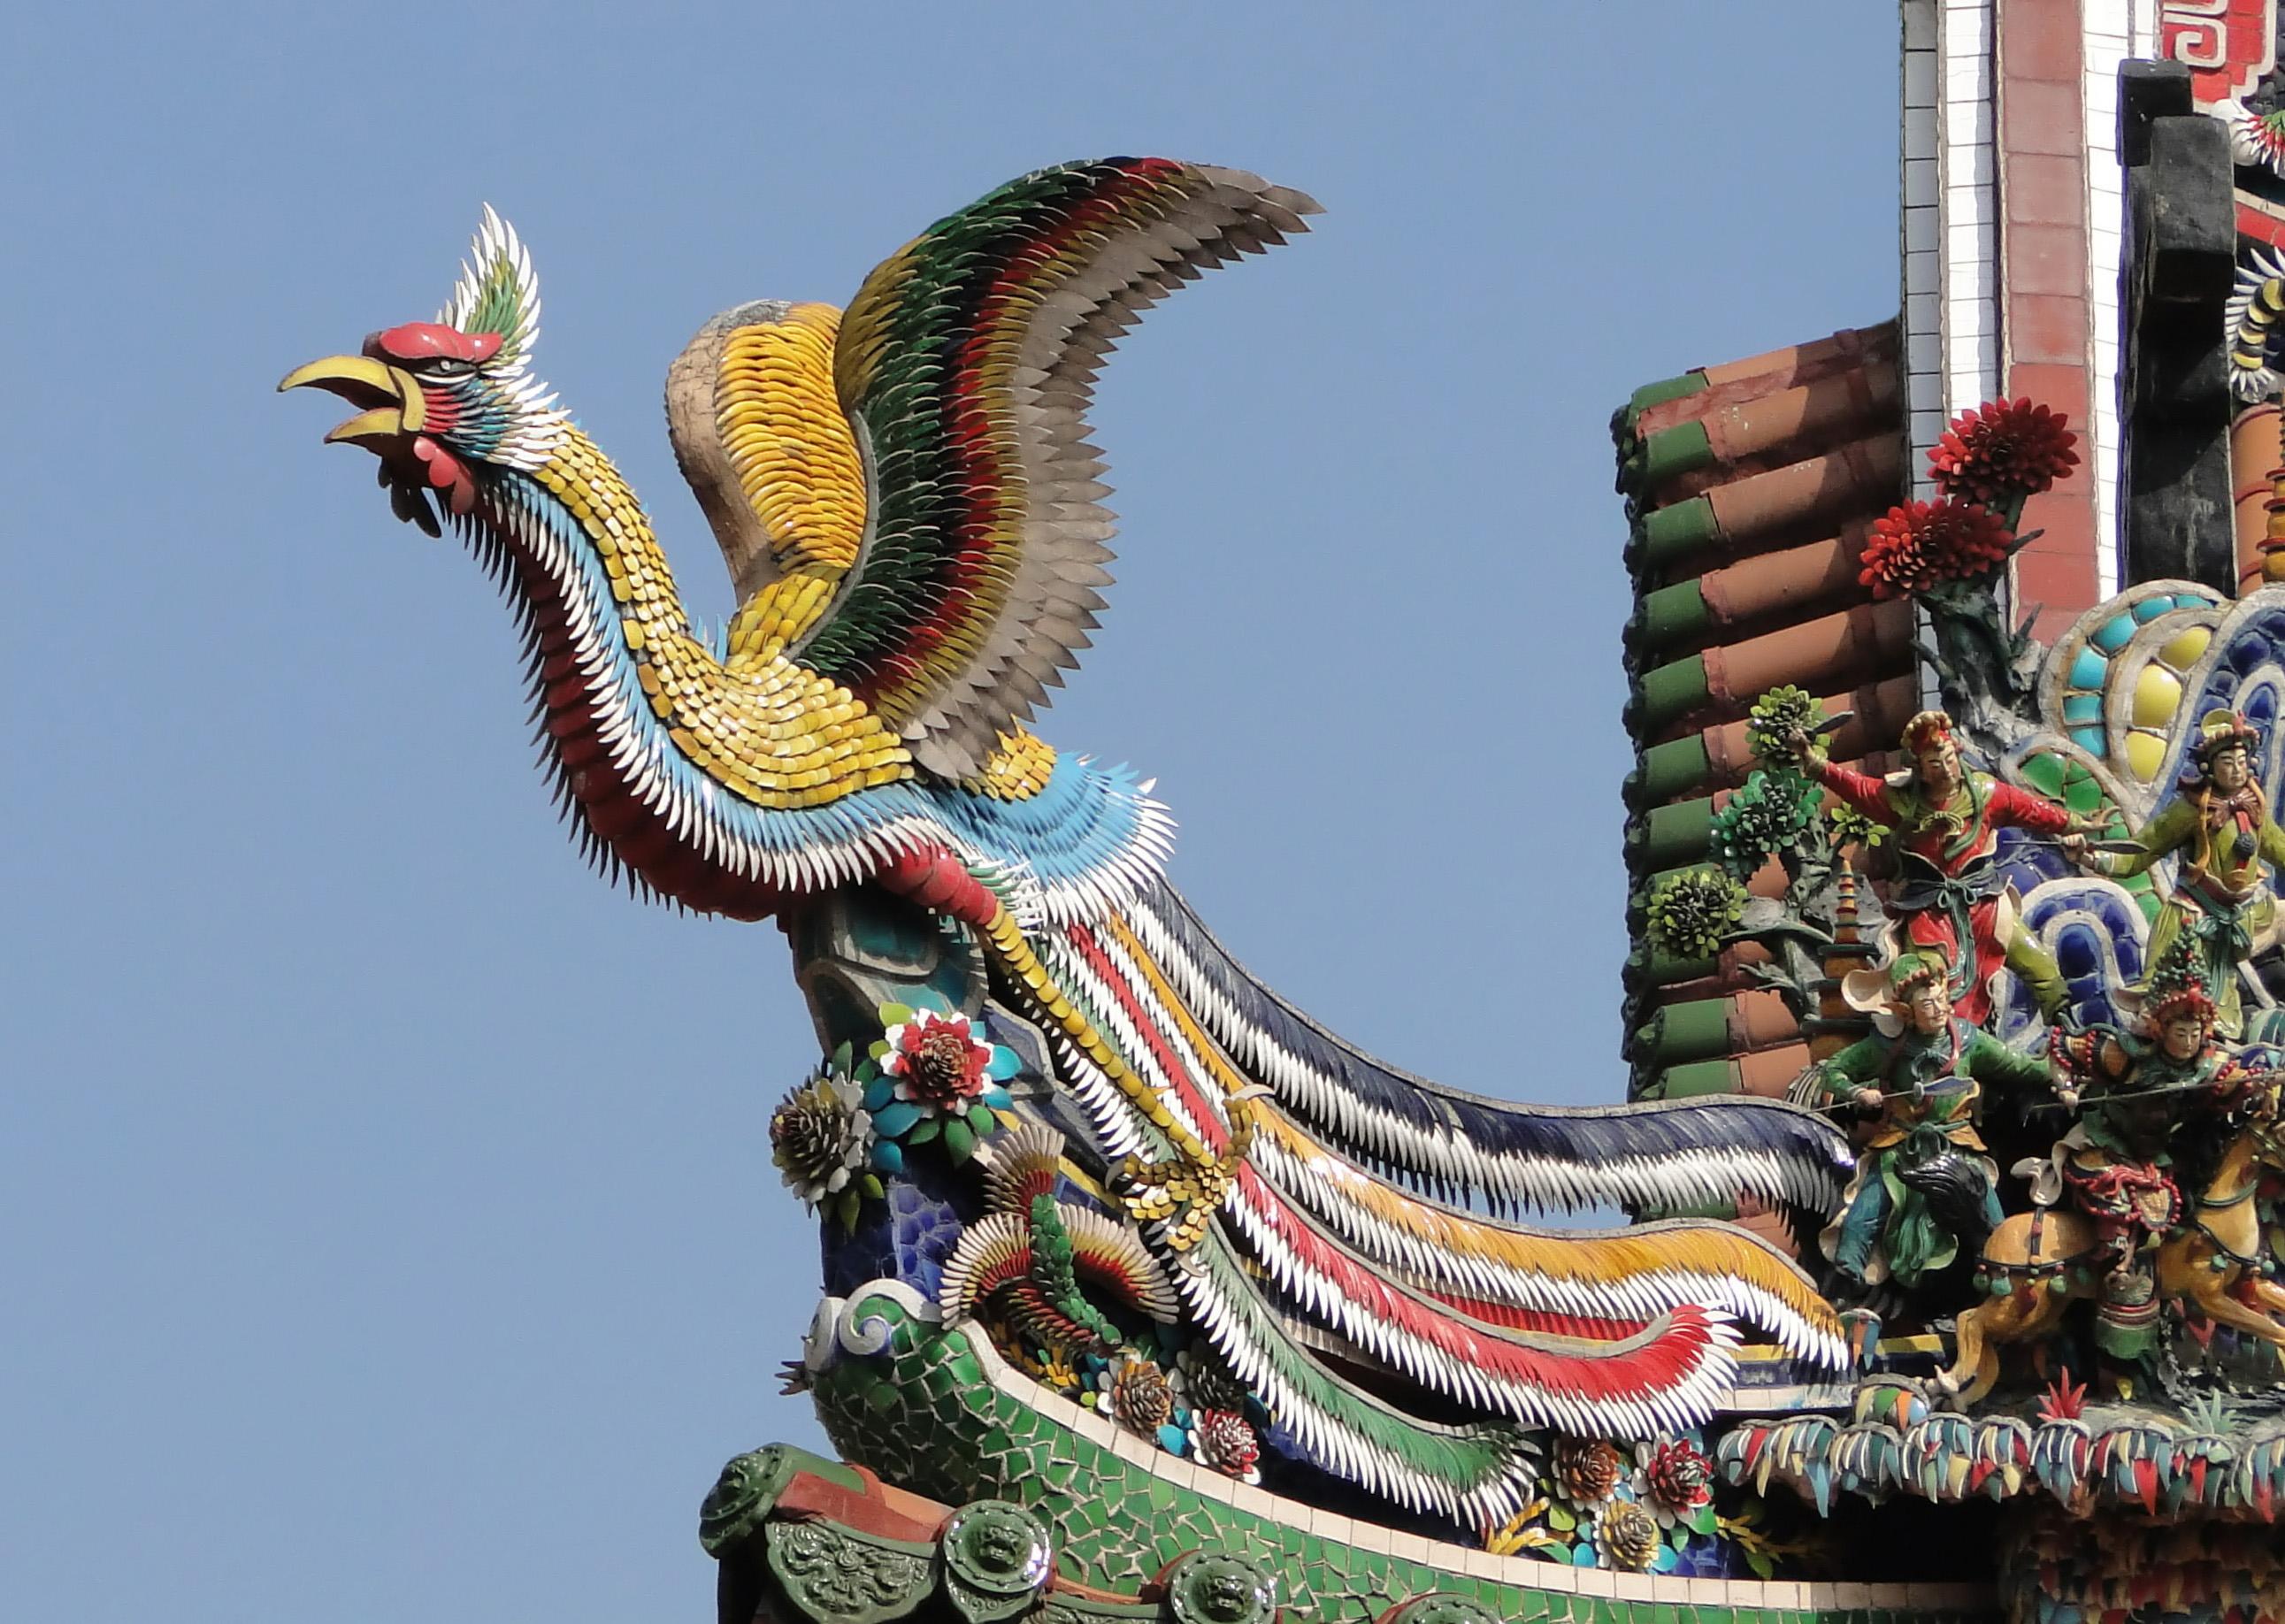 Fenghuang wikipedia meaningedit buycottarizona Choice Image